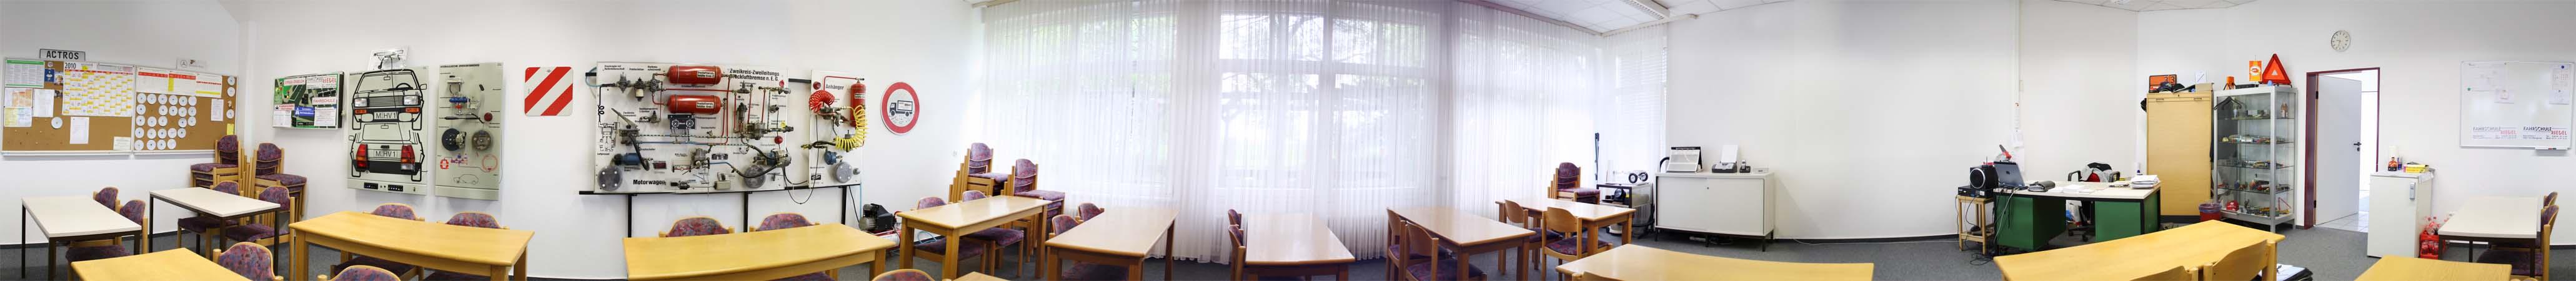 Panorama Klassenraum